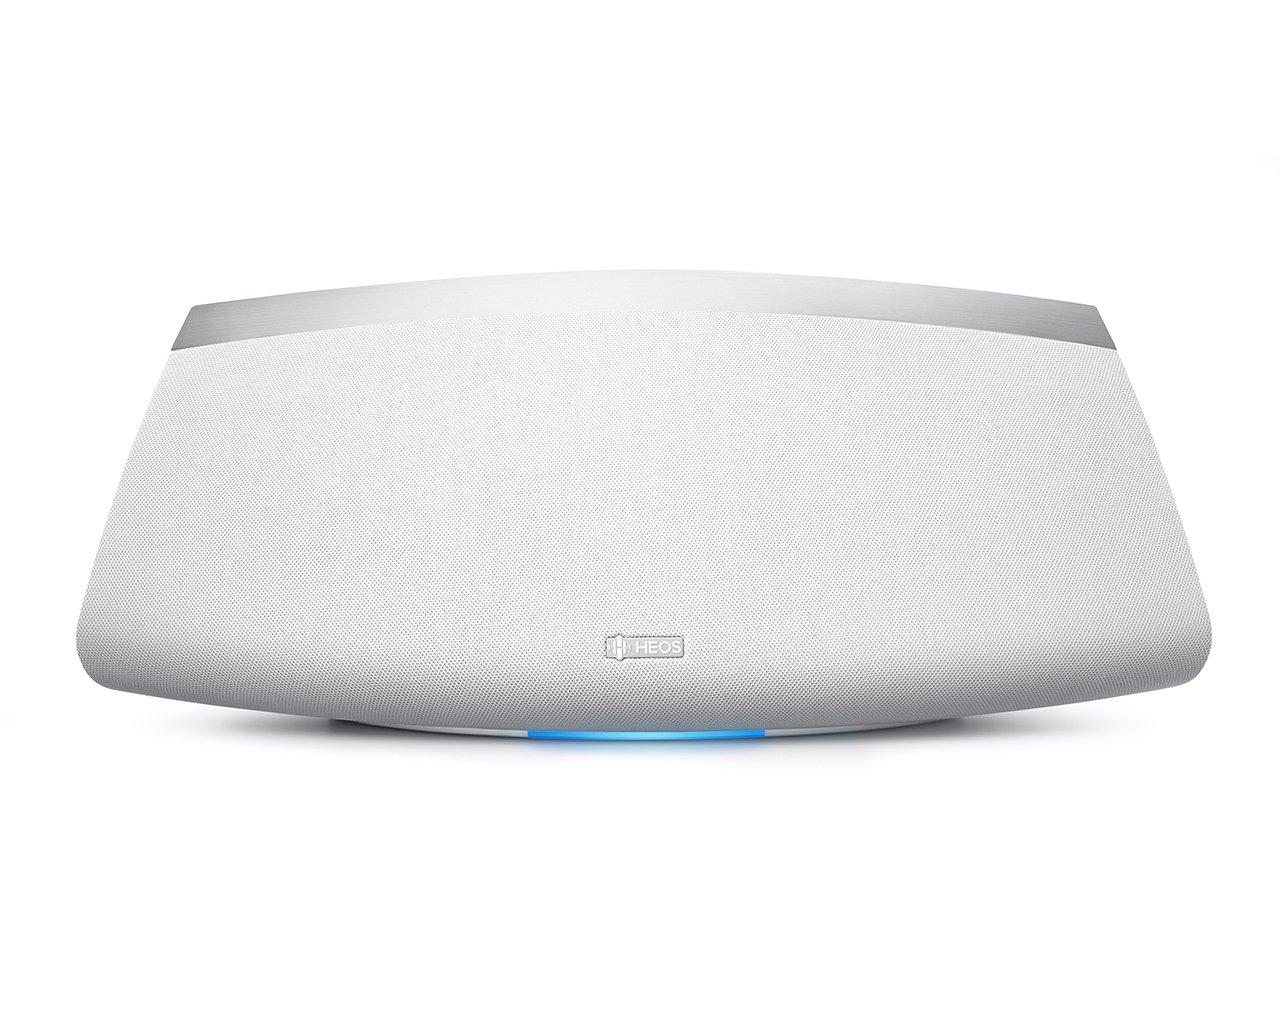 Denon HEOS 7 Large Wireless Speaker